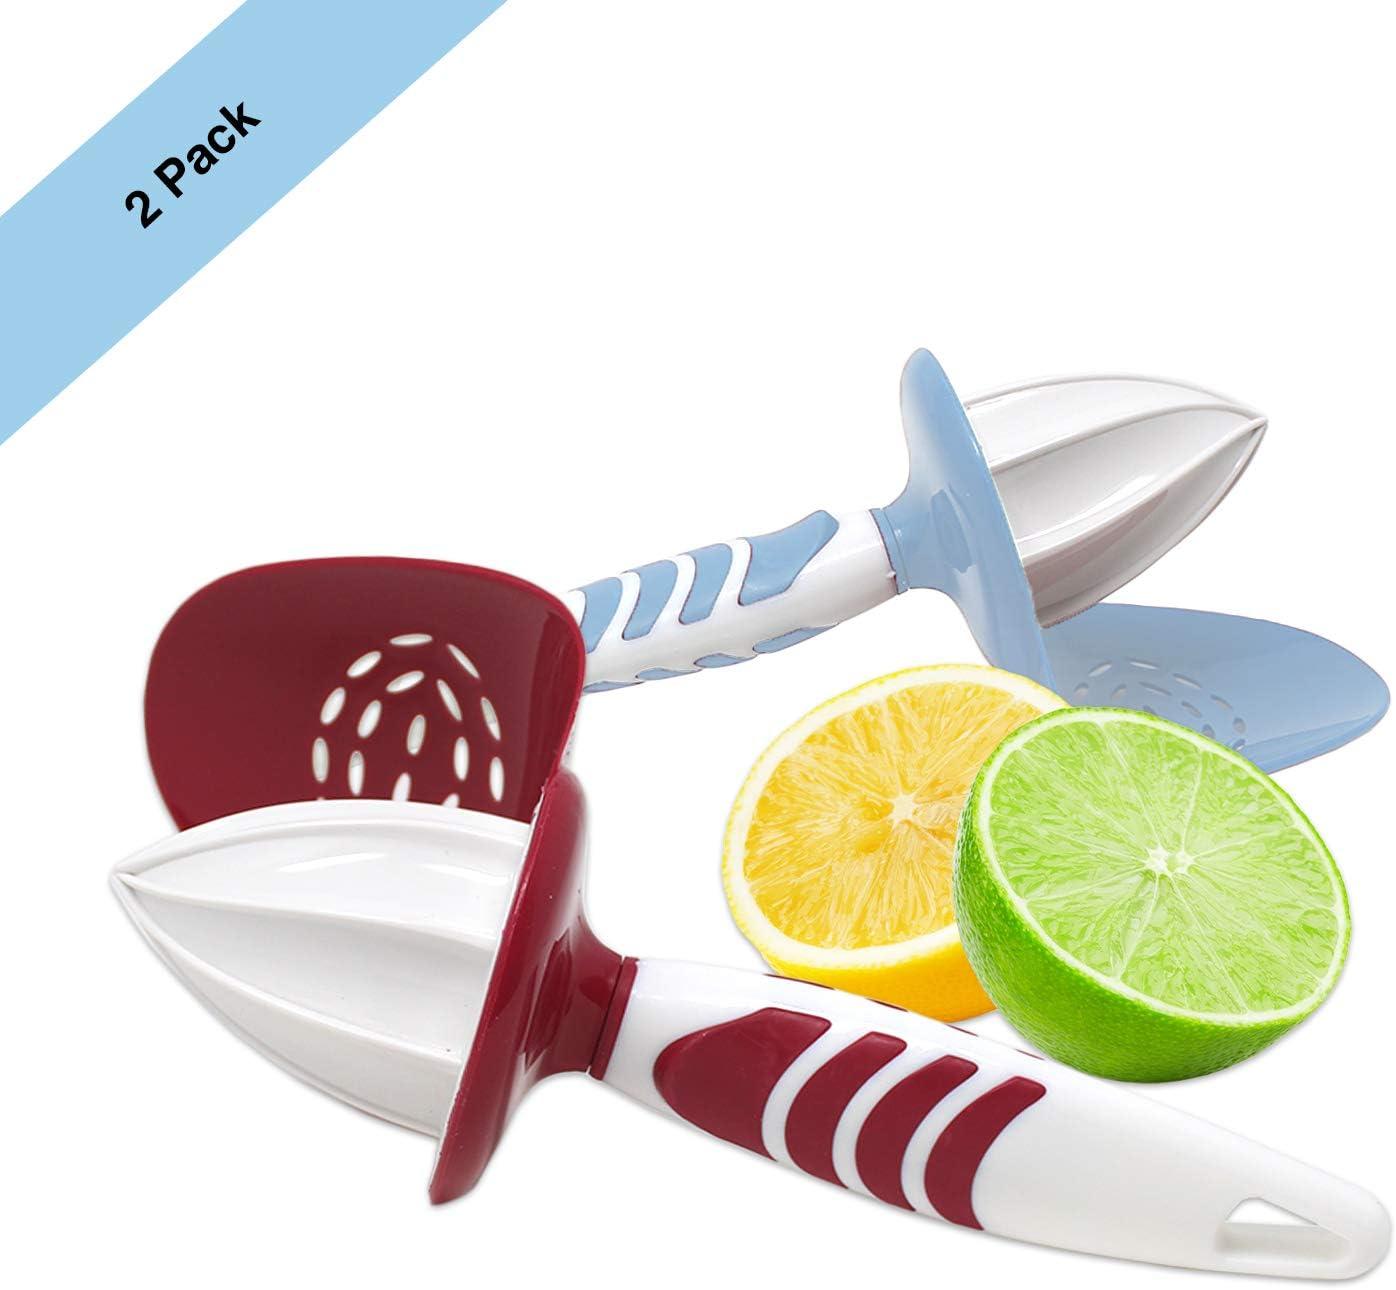 Lemon Lime Squeezer with Seed Catcher lemon juicer handheld | Comfort Grip Citrus Reamer | BPA Free | Assorted Colors (2 Pack)